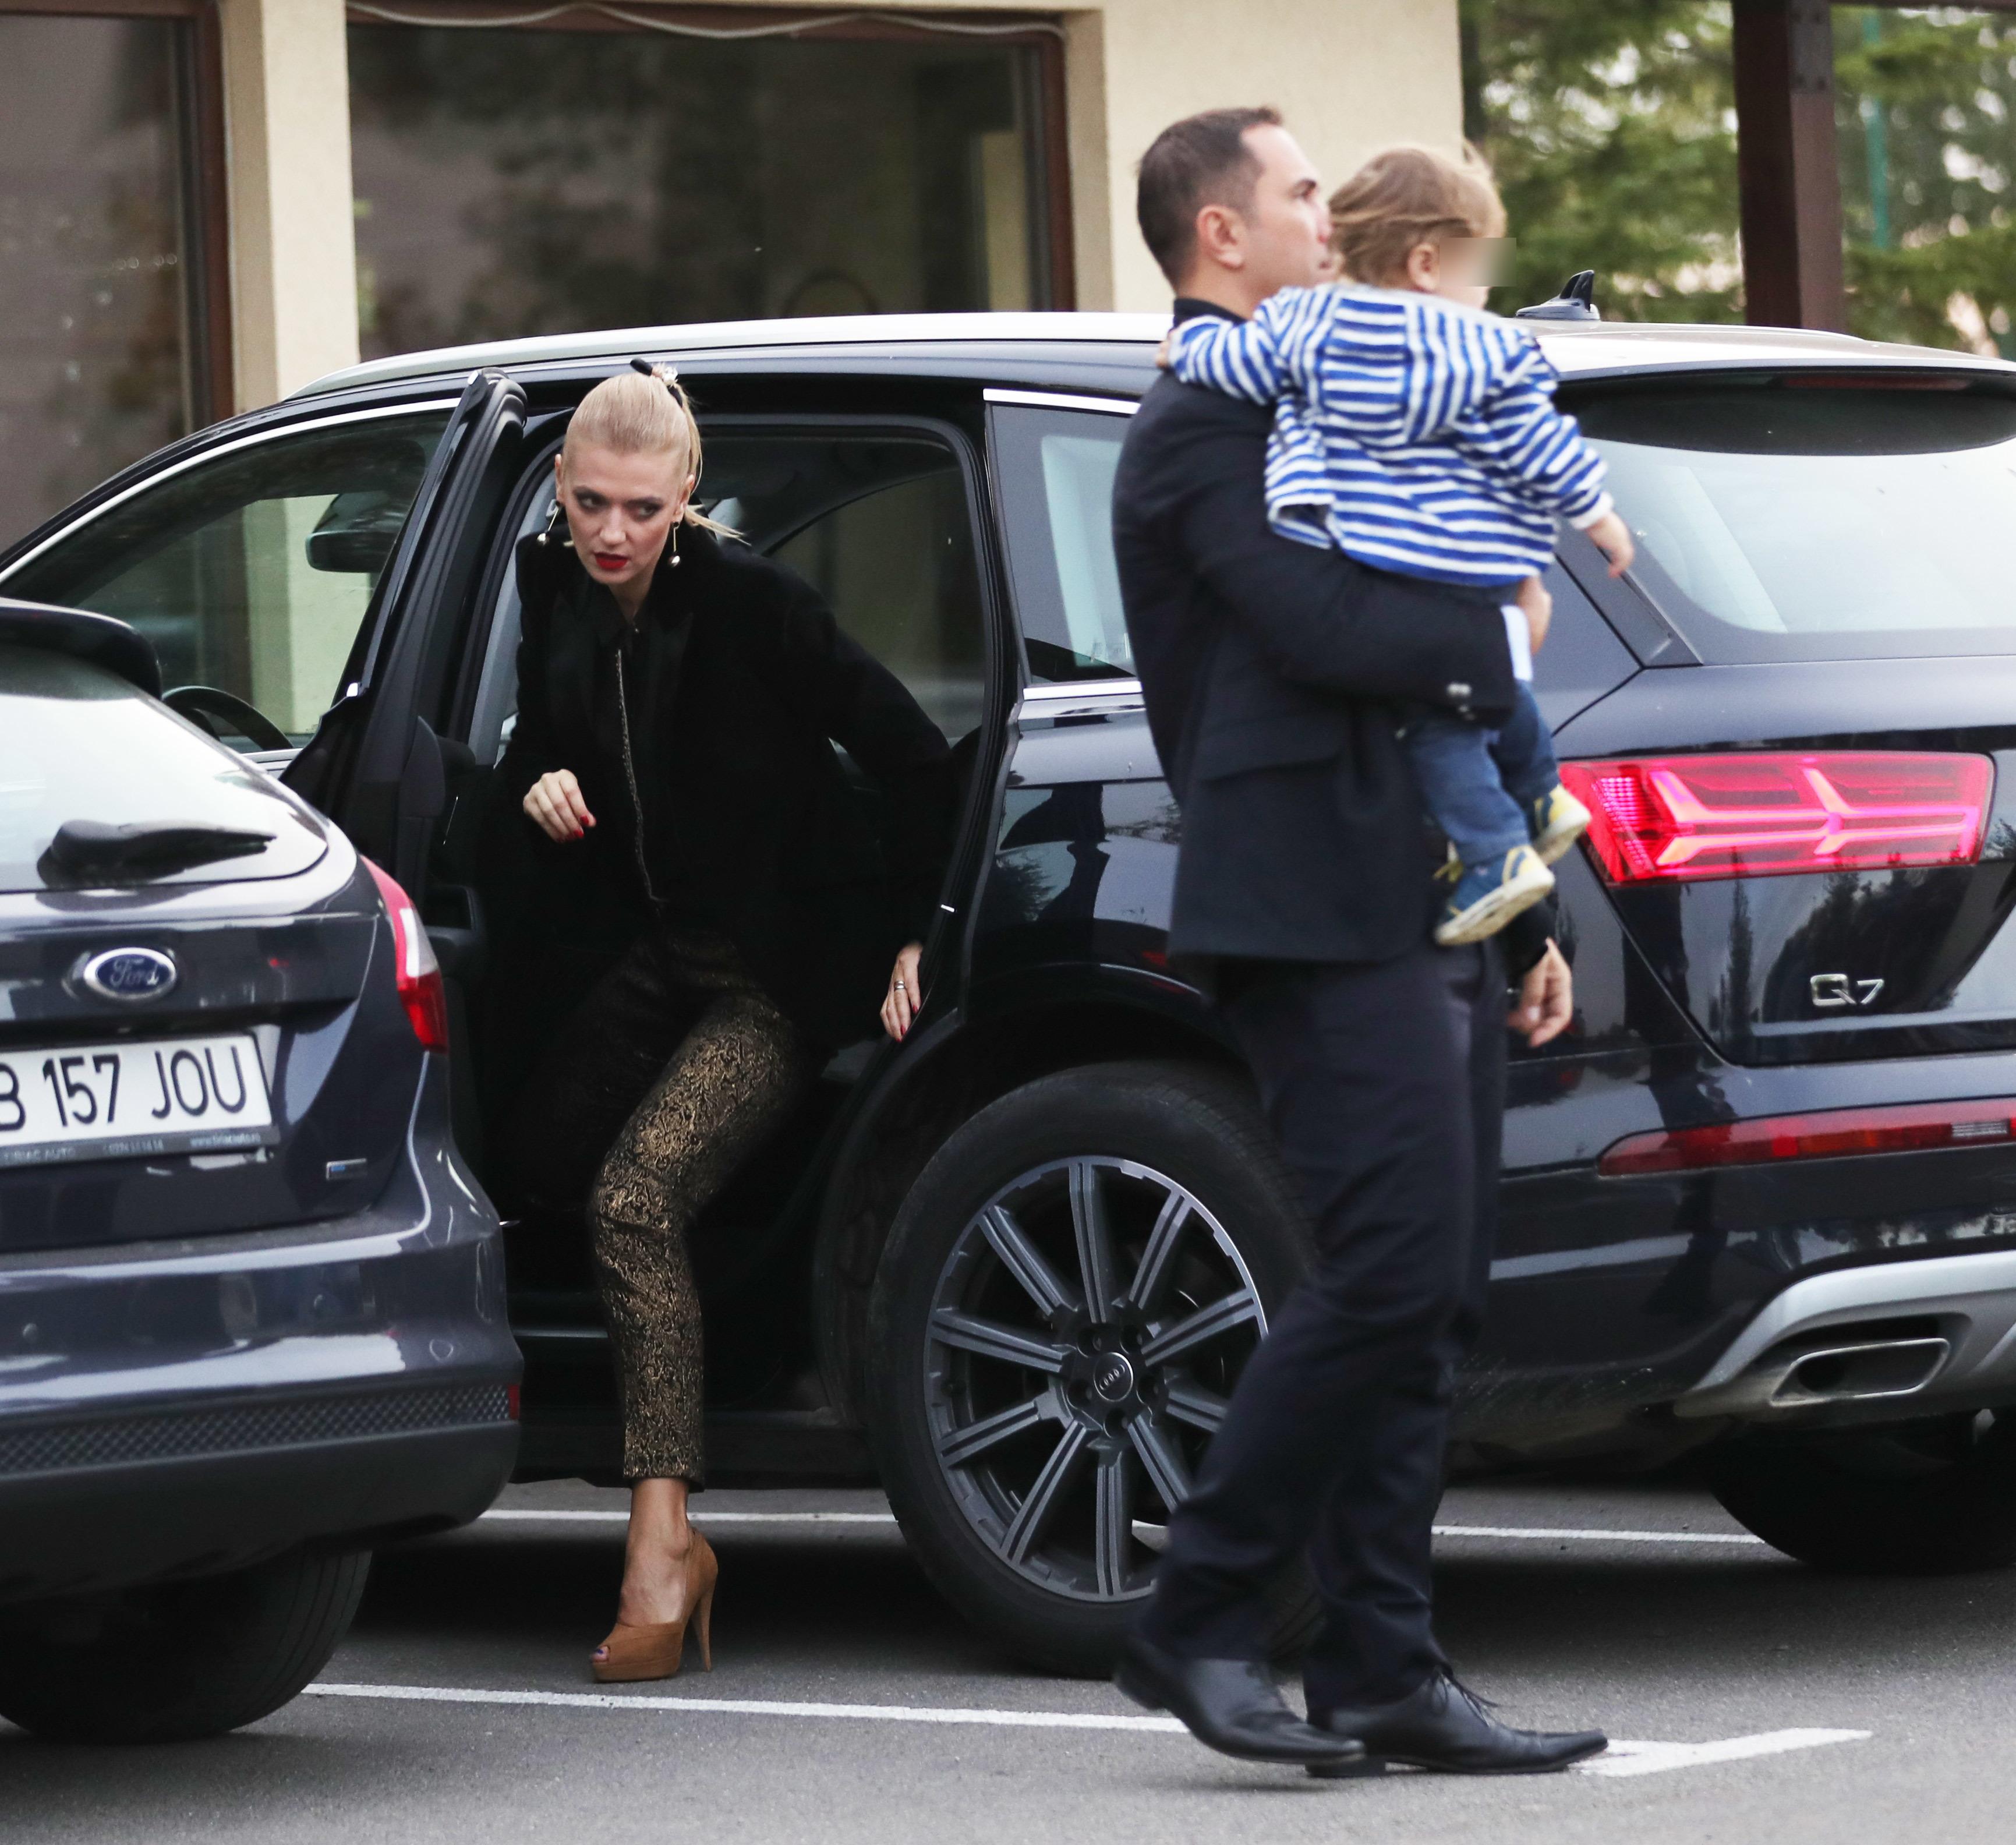 Lucian Isar și Alina Gorghiu au grave probleme financiare